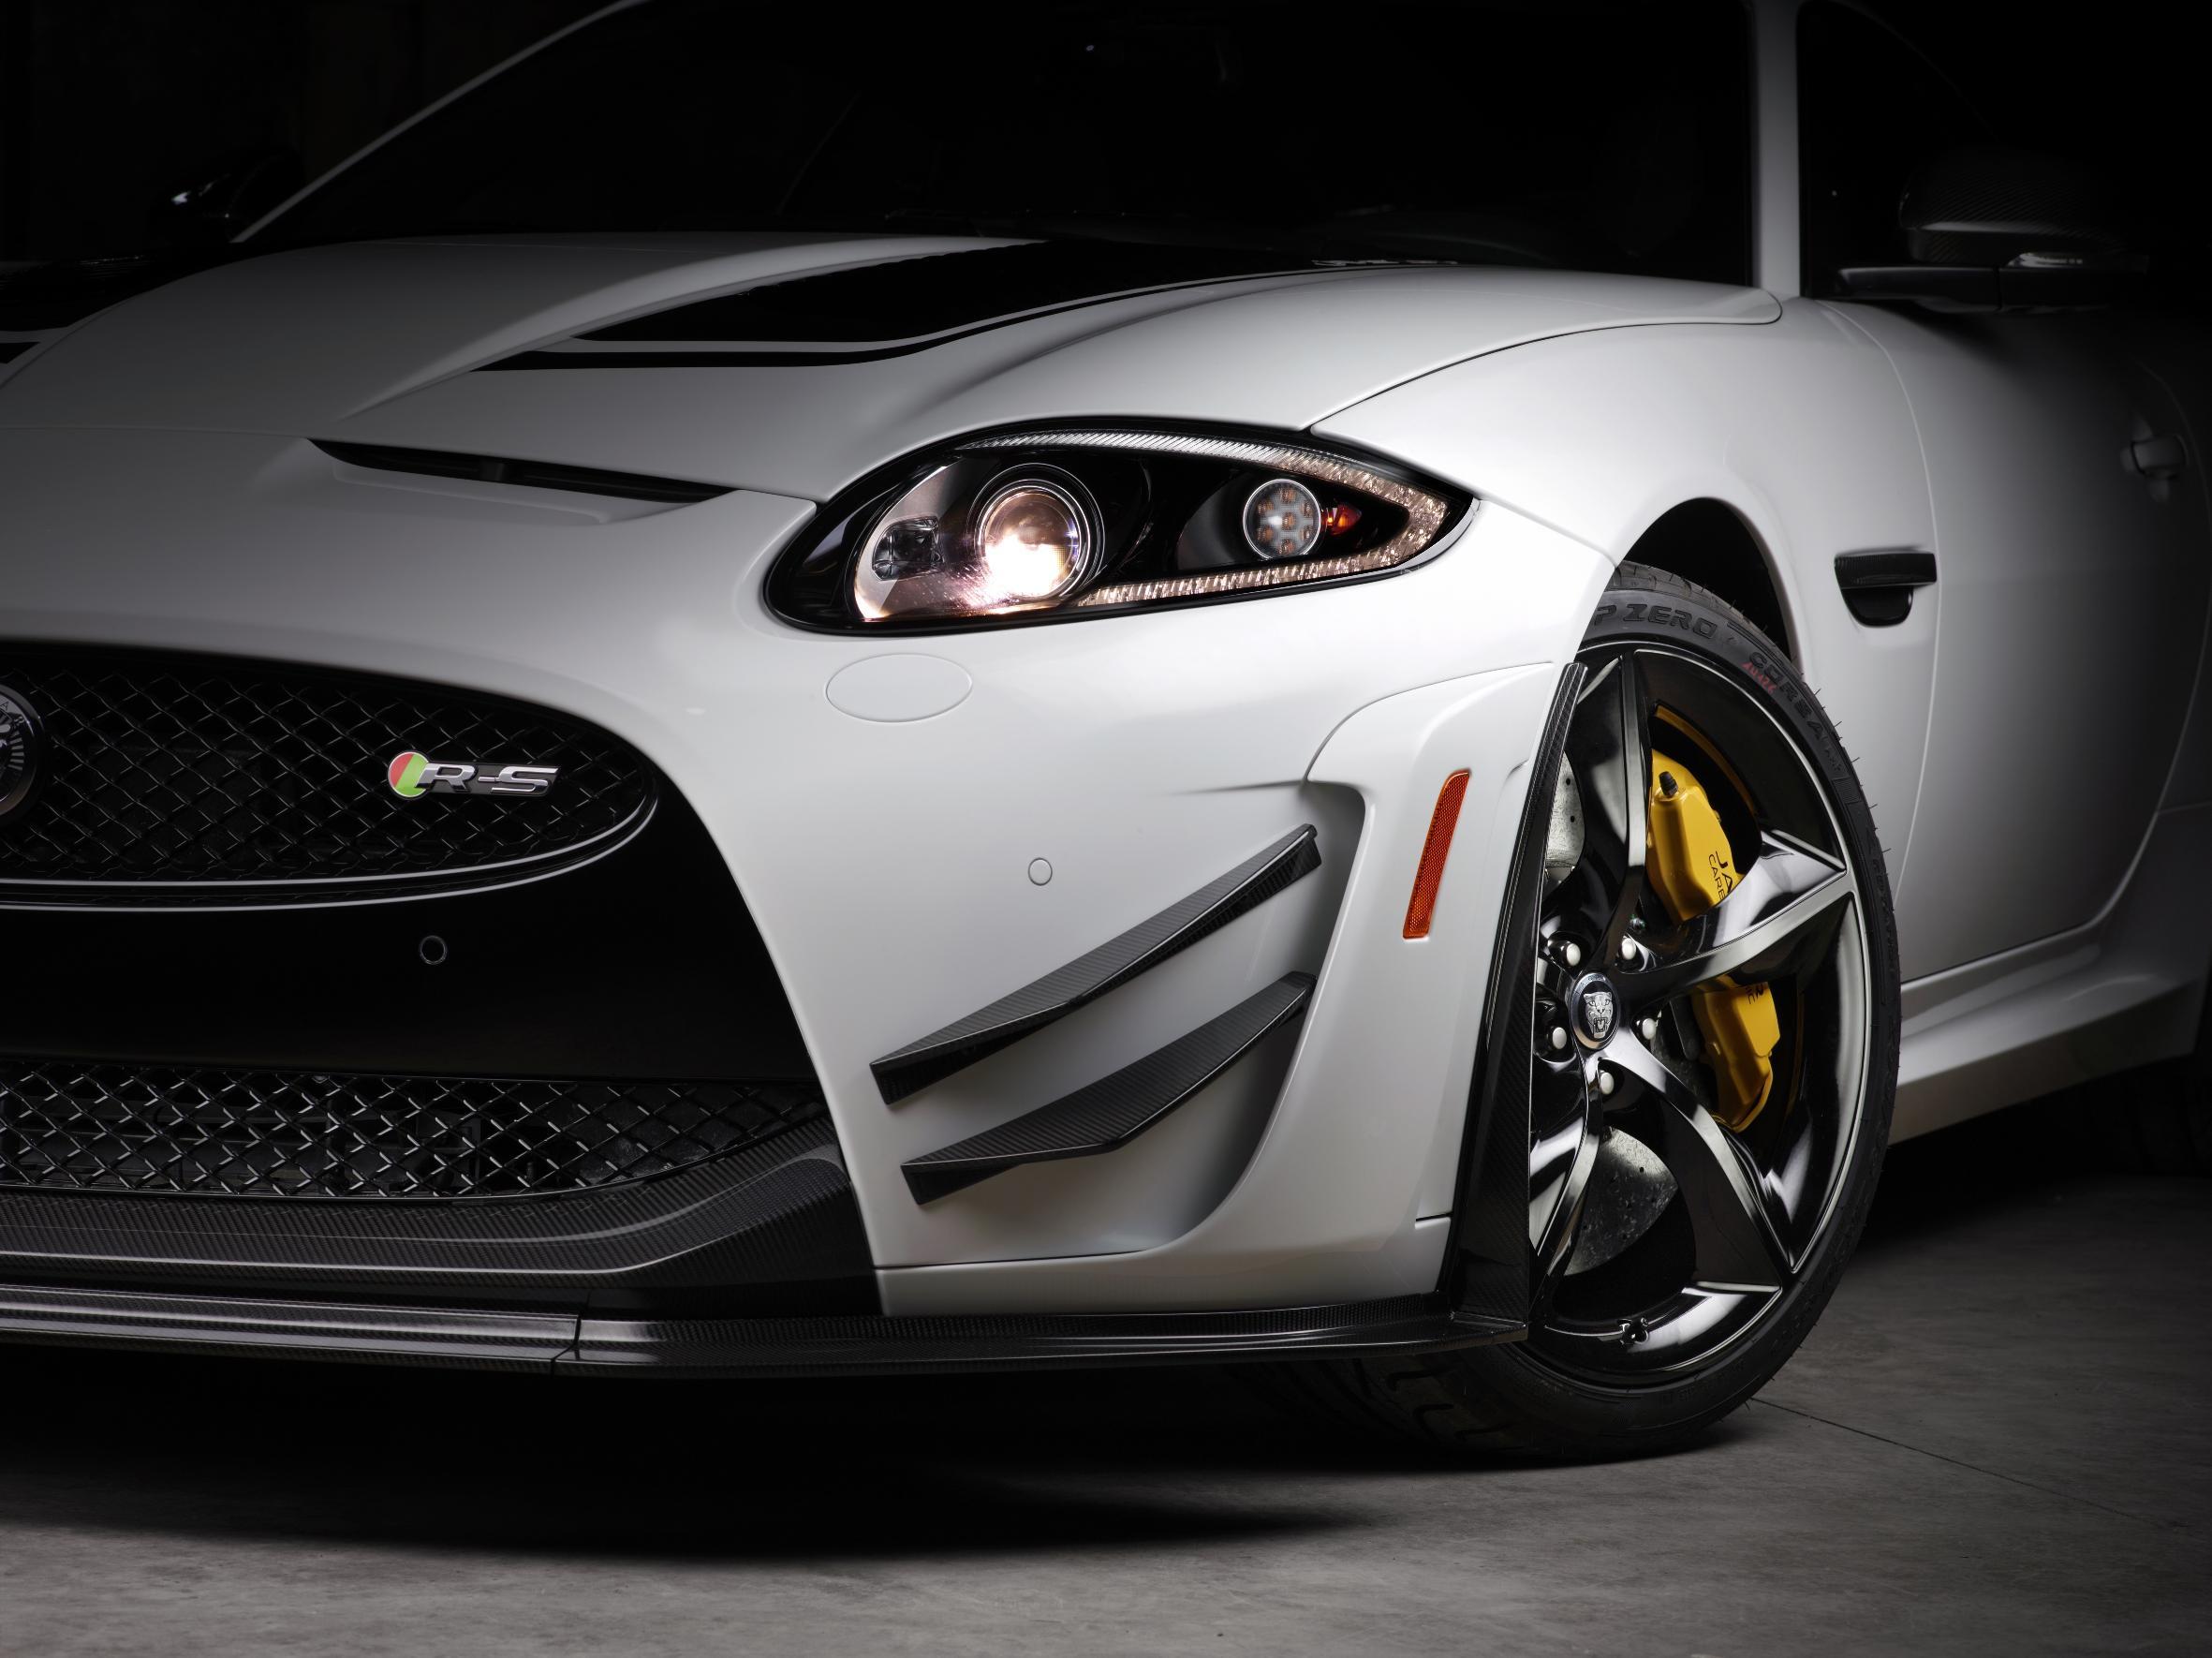 new car concept jaguar price cnynewcars msrp suvs prices suv com wallpapers list